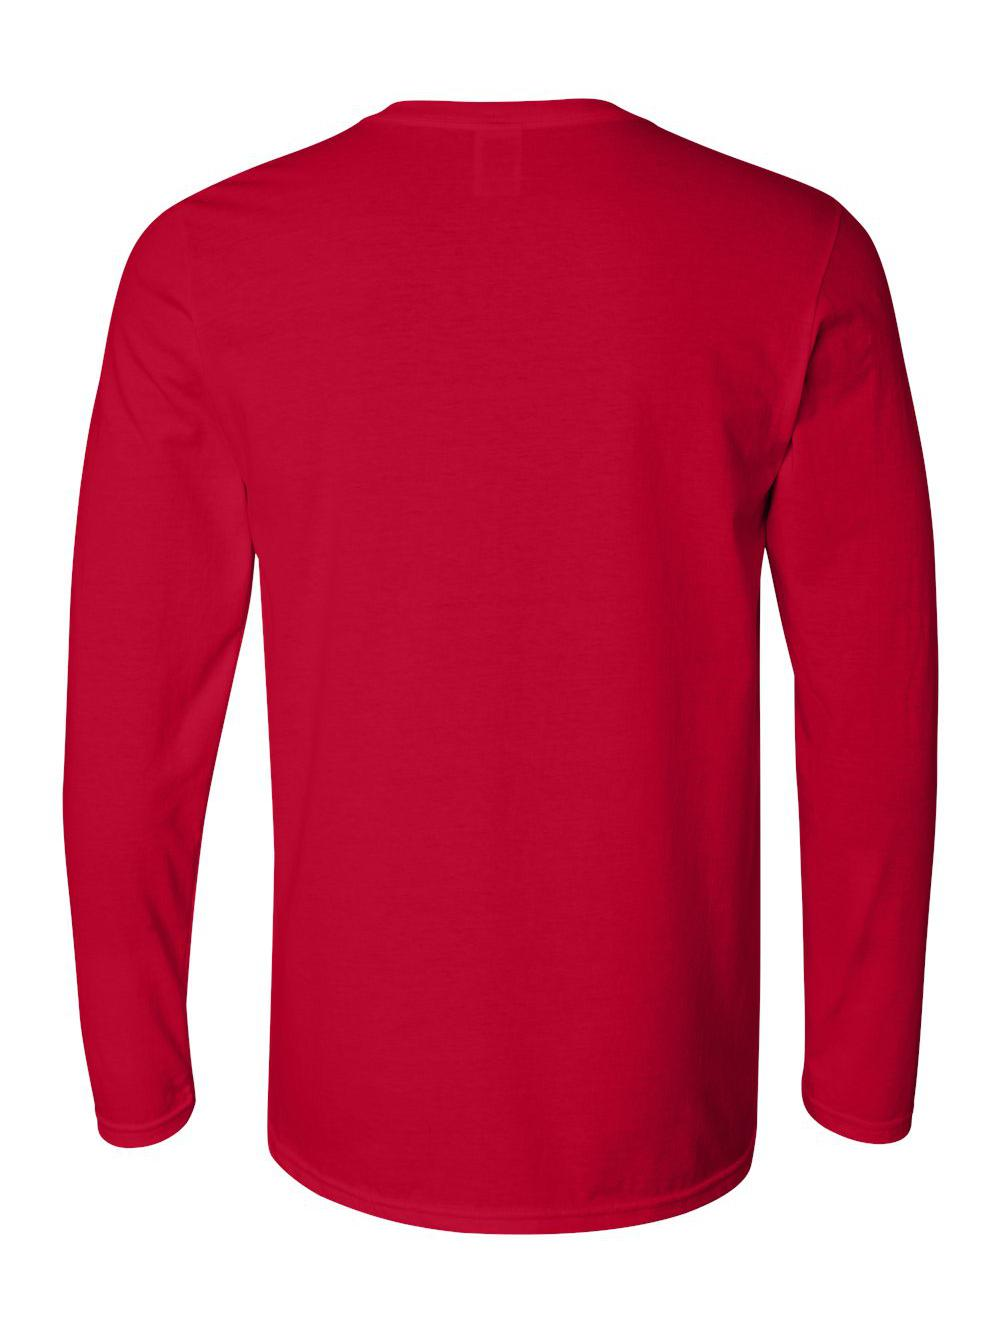 Gildan-Softstyle-Long-Sleeve-T-Shirt-64400 thumbnail 10